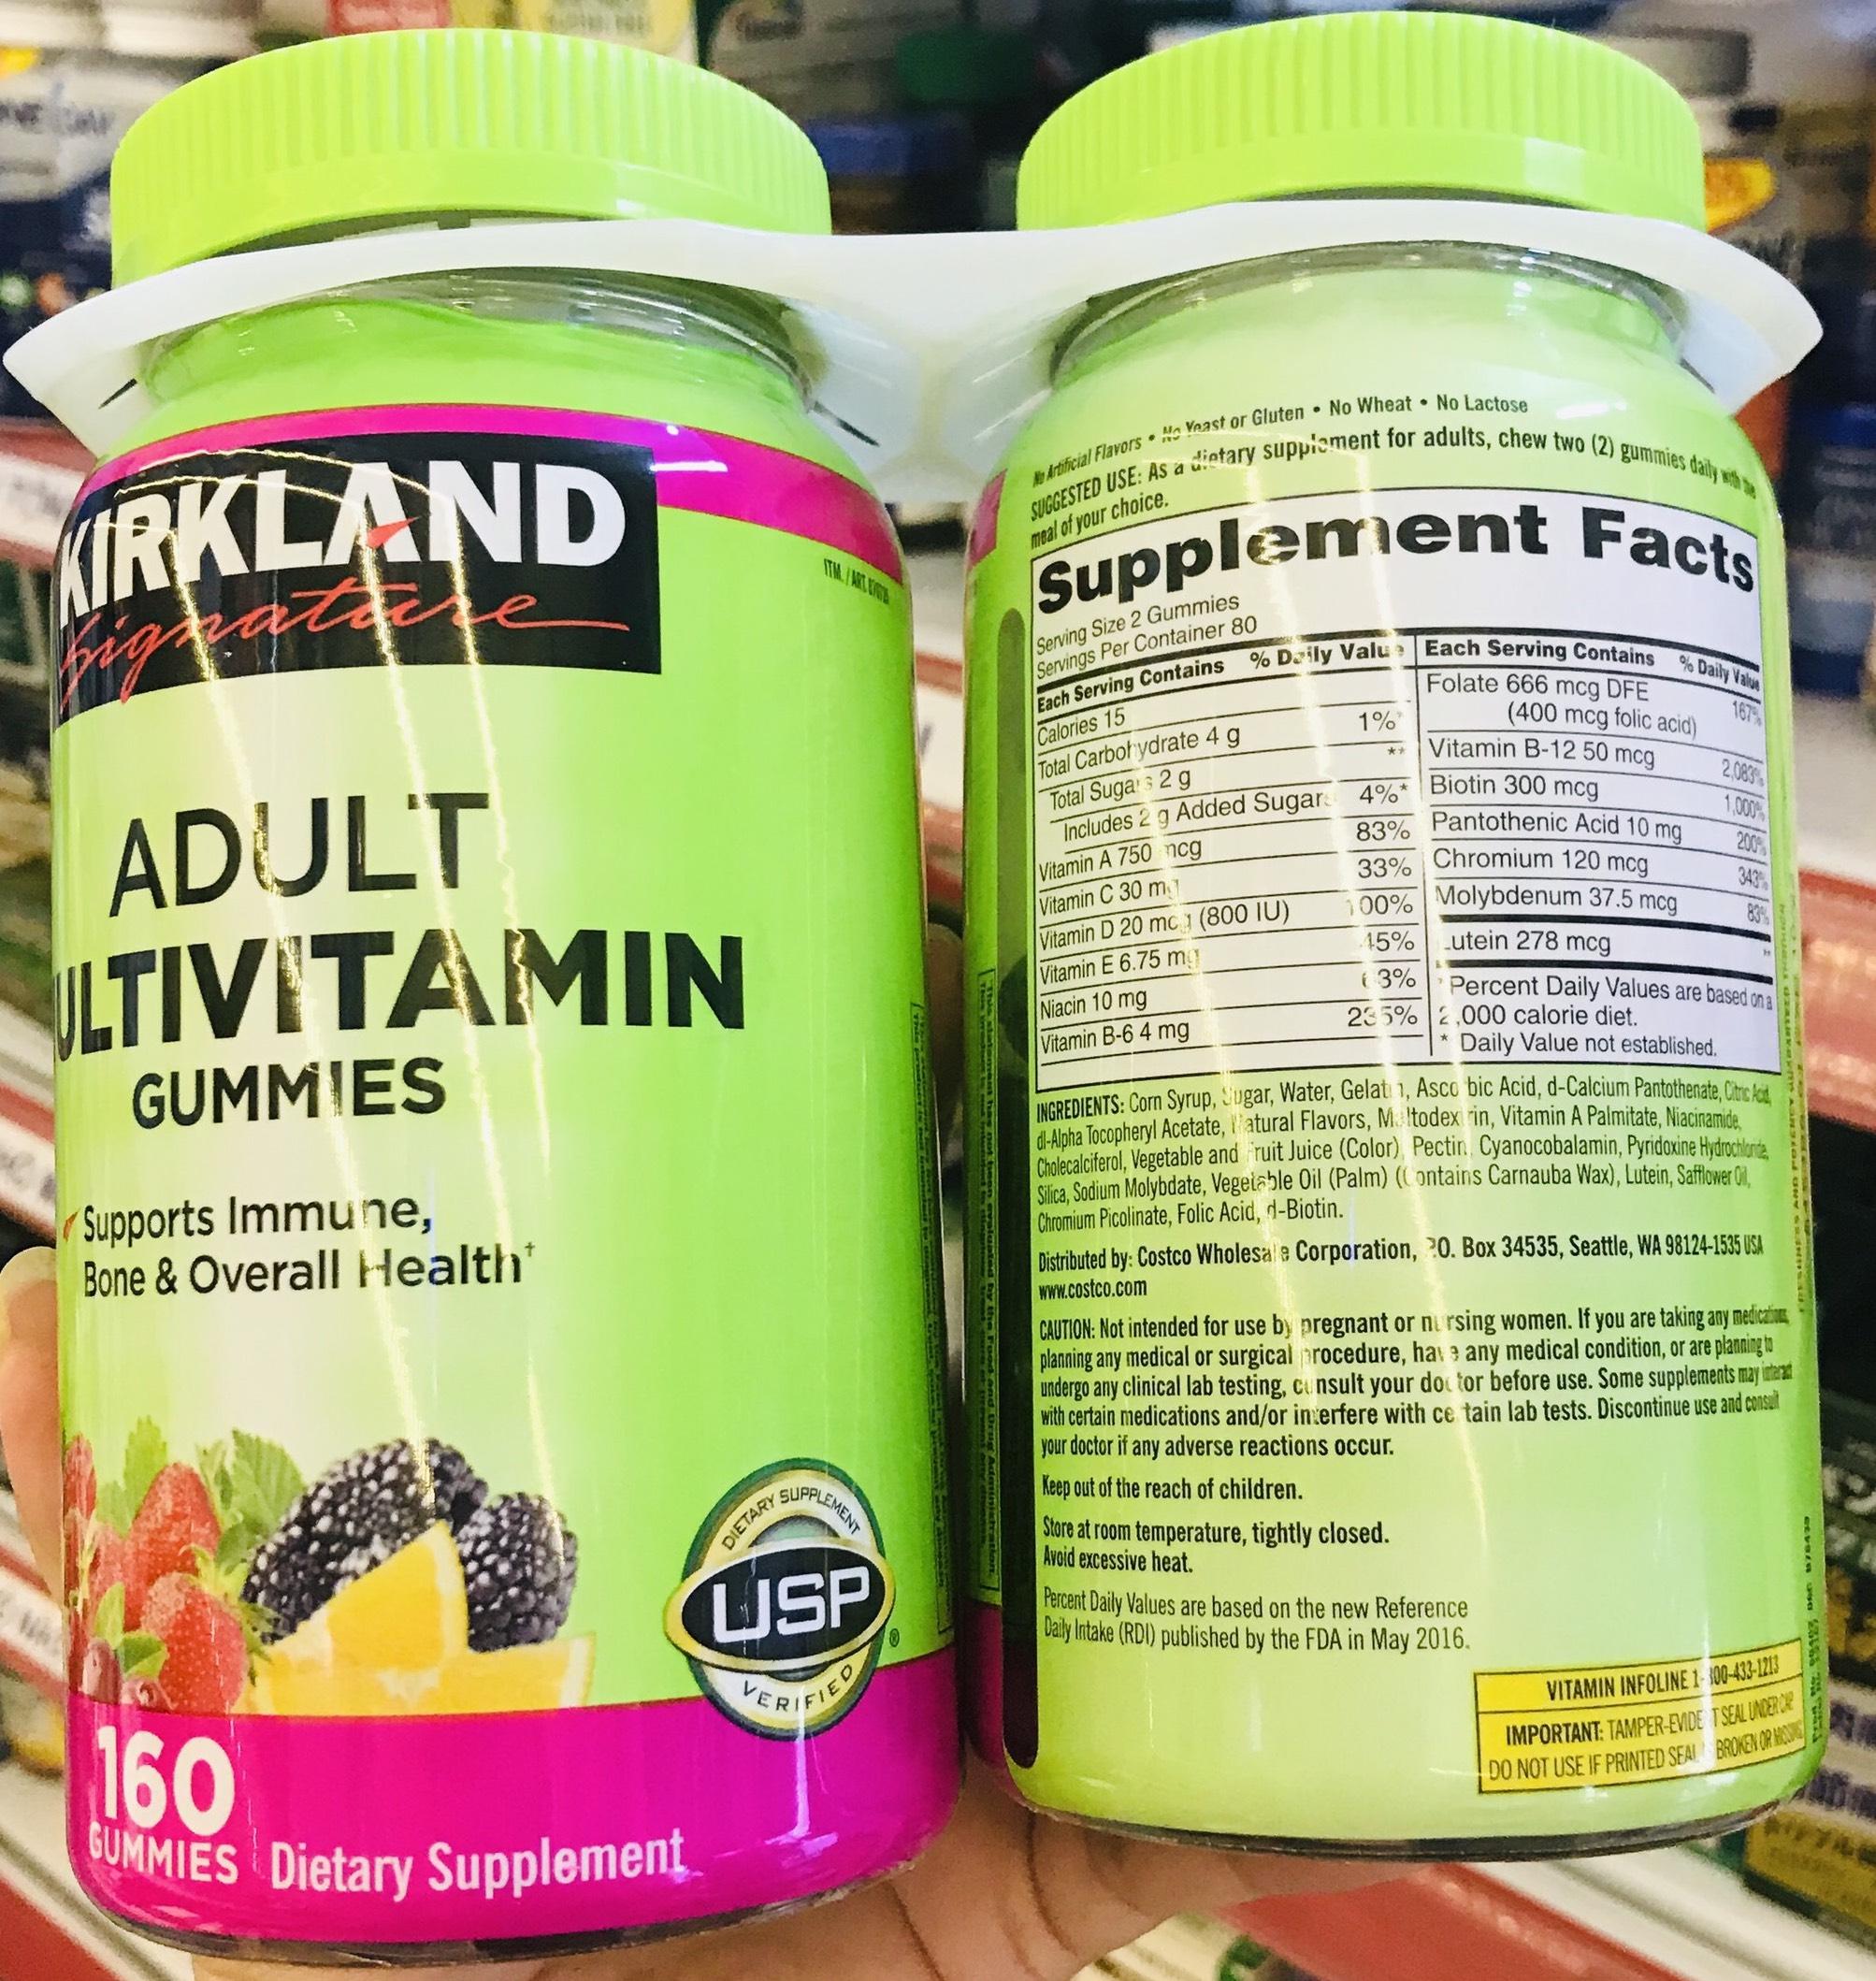 thanh phan keo deo bo sung vitamin kirkland signature adult multivitamin gummies